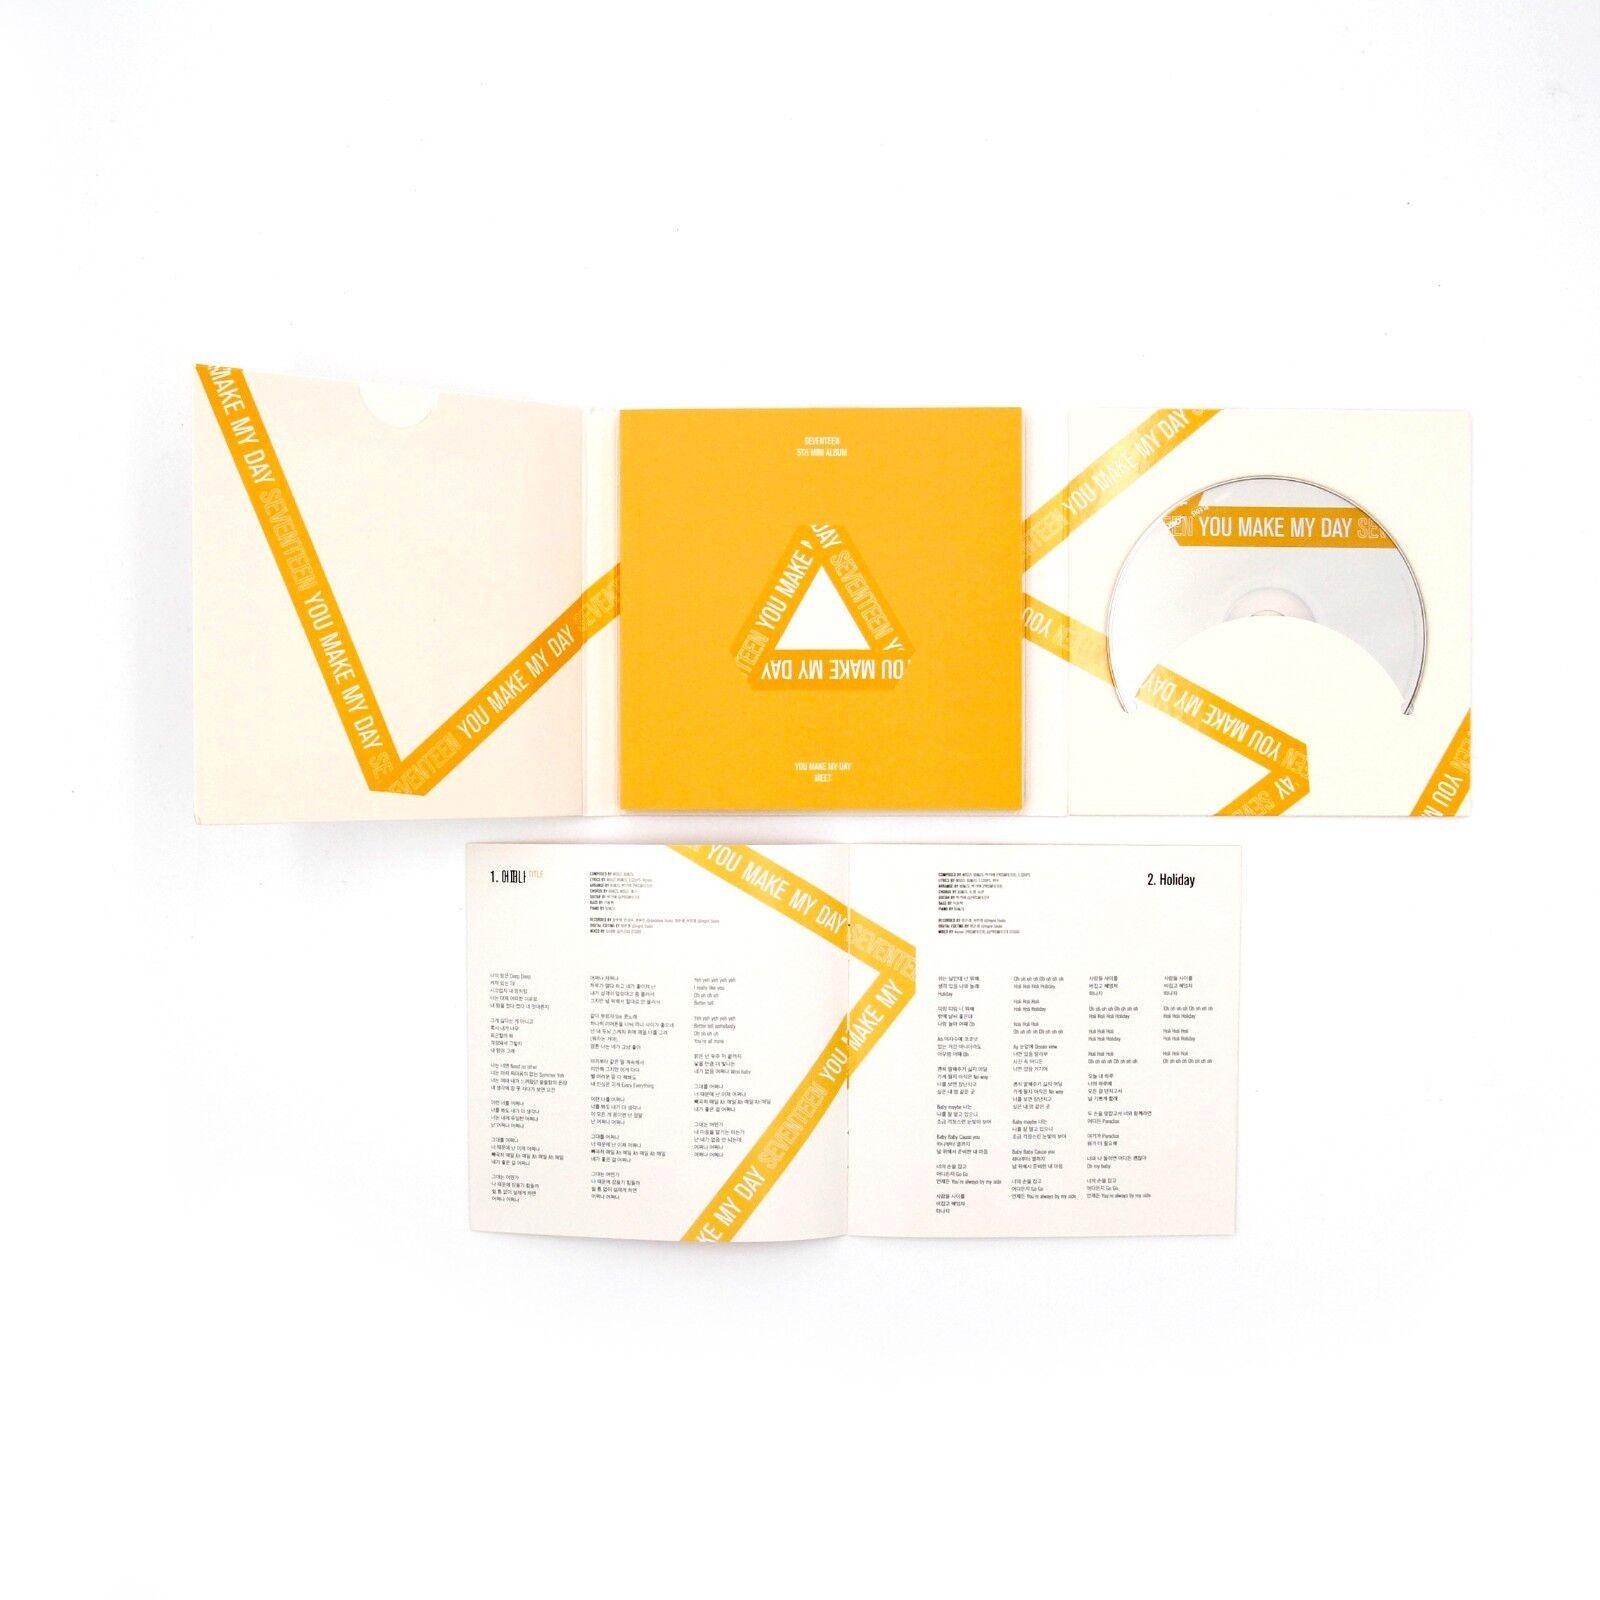 Seventeen 5th Mini Album You Make My Day 3cd Set 3 Poster